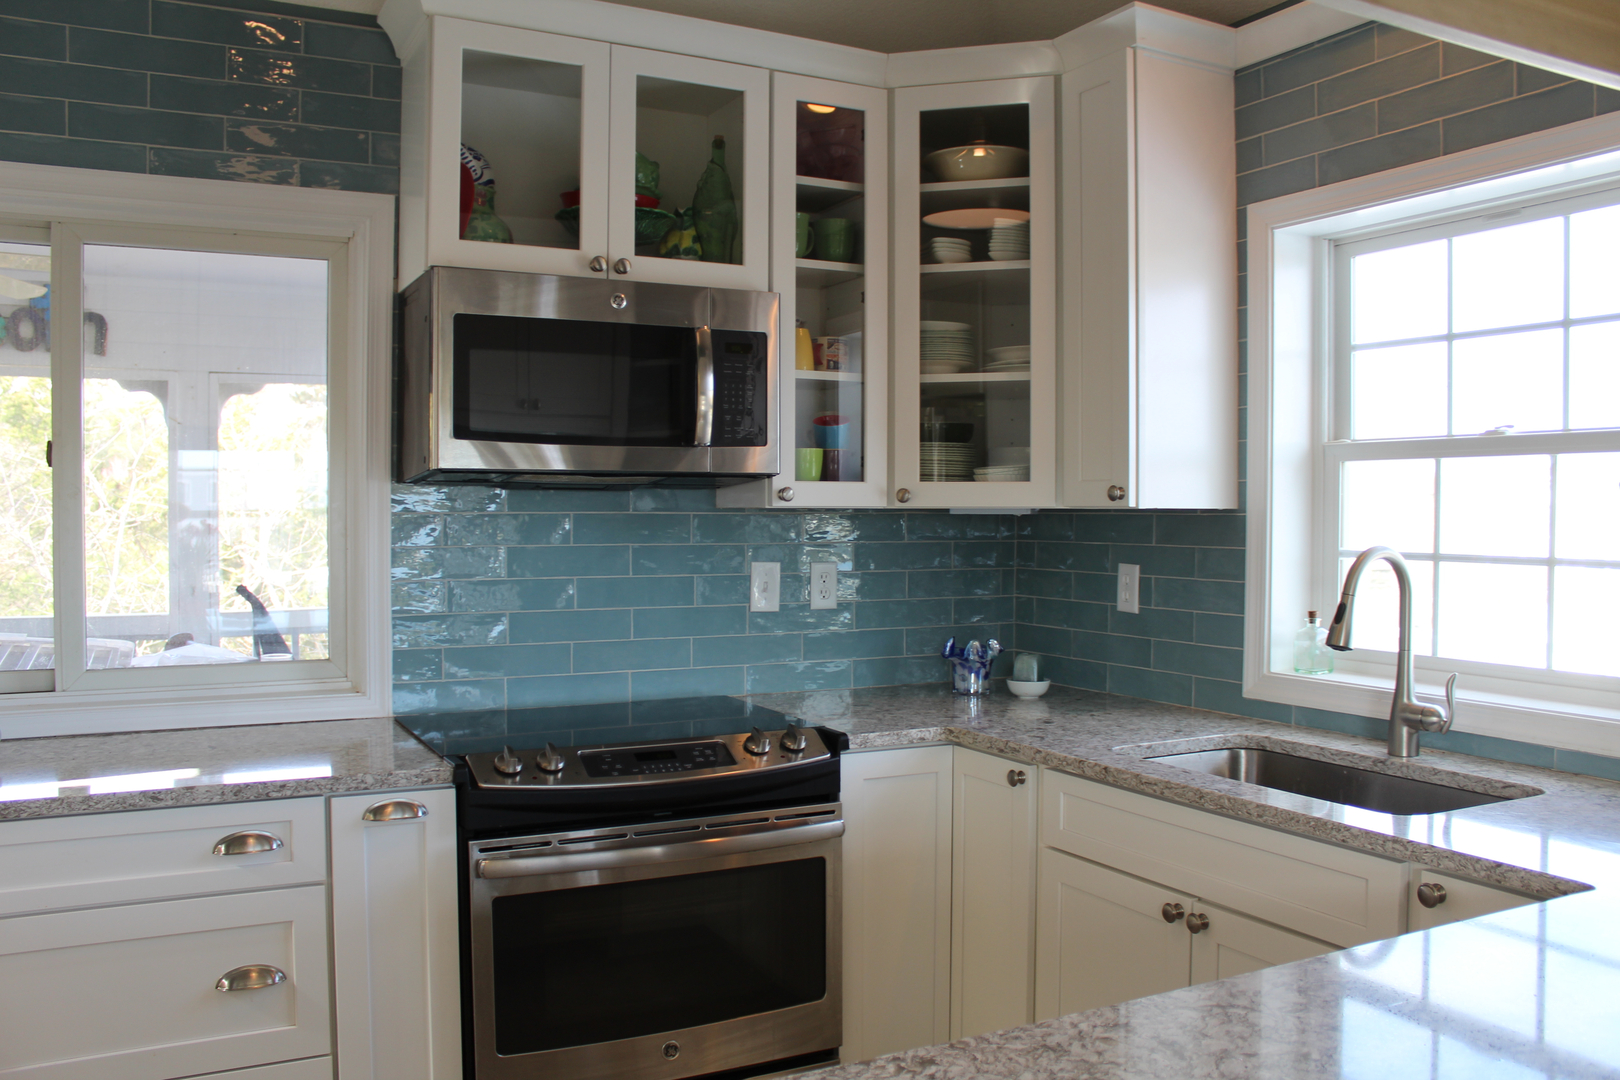 Atlantic Kitchen And Bath Llc Kitchen Renovation Baths Kitchen Remodel Ideas